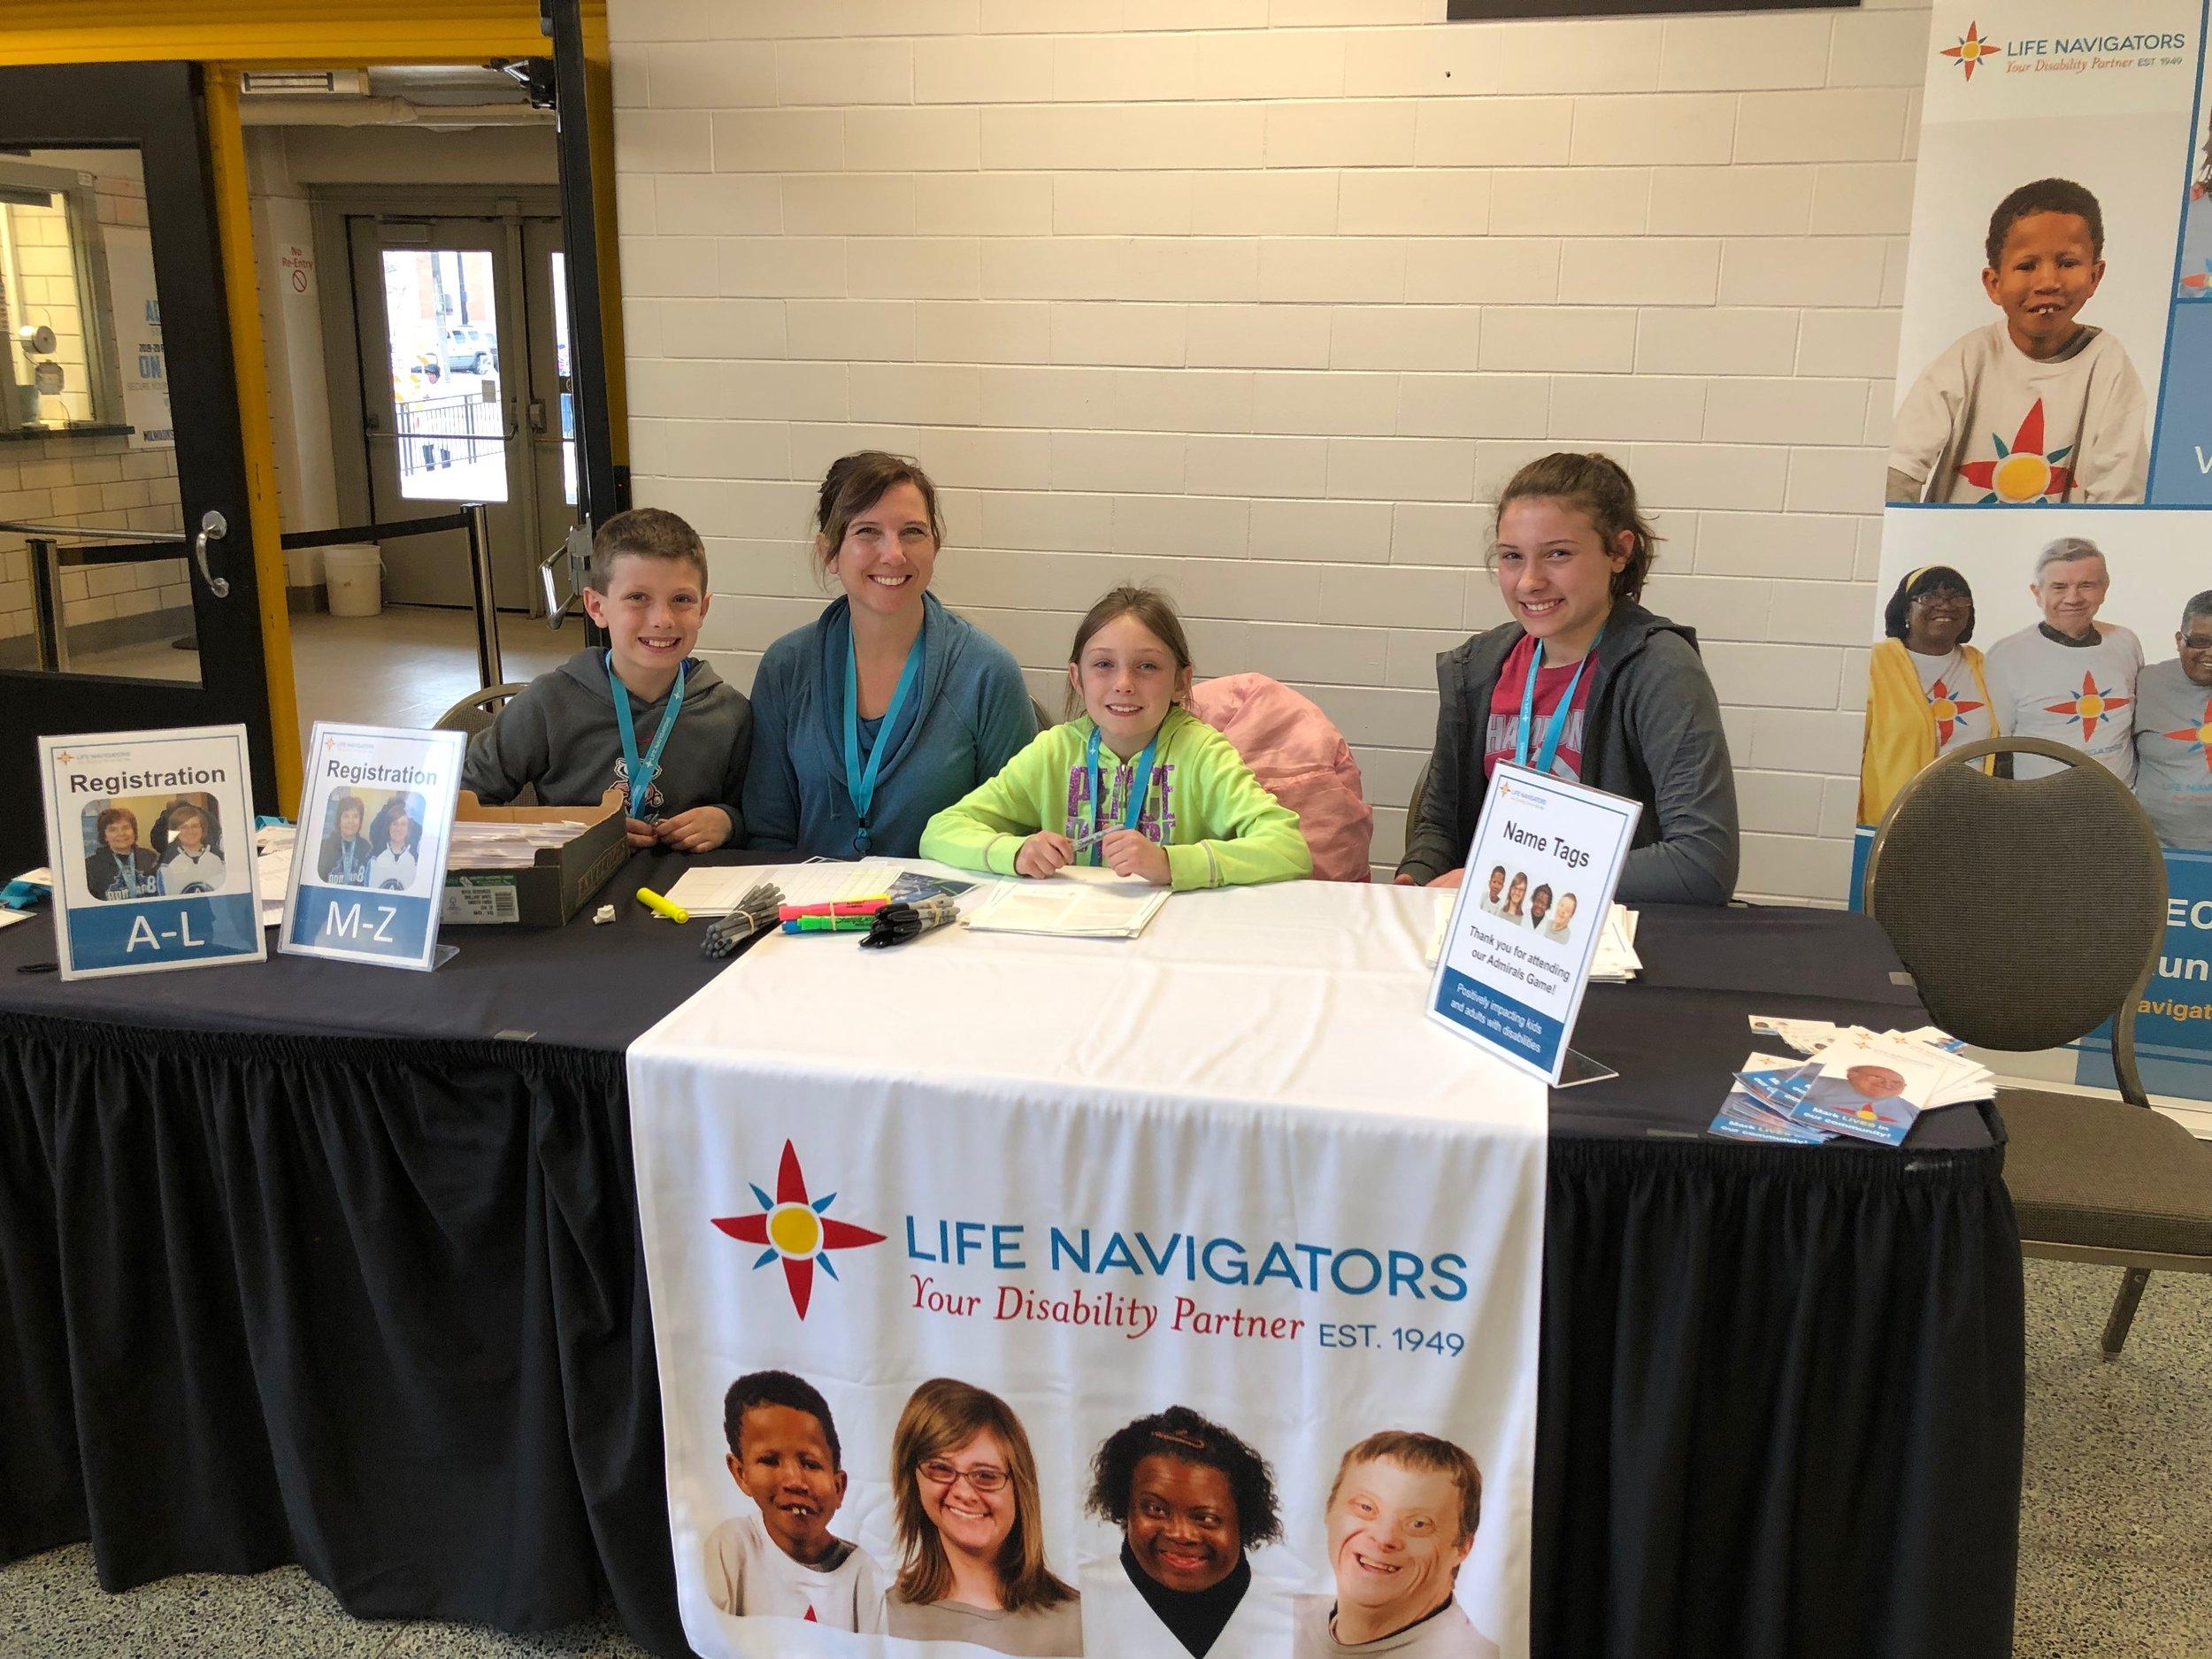 Life Navigators Mission